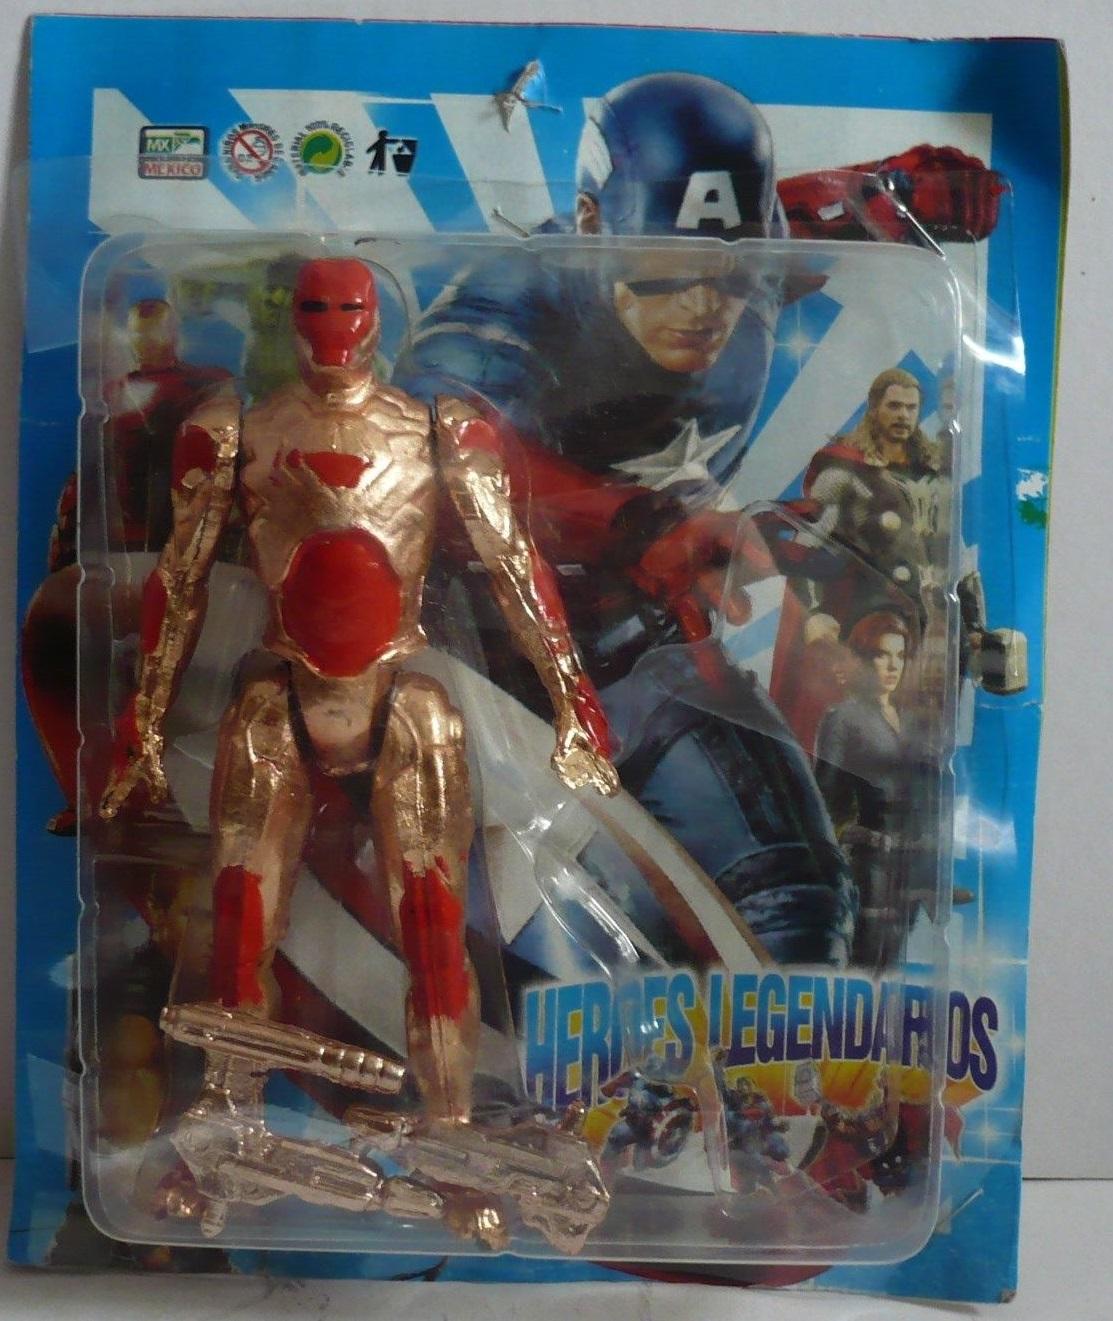 Iron Man (Legendary Heroes figure)